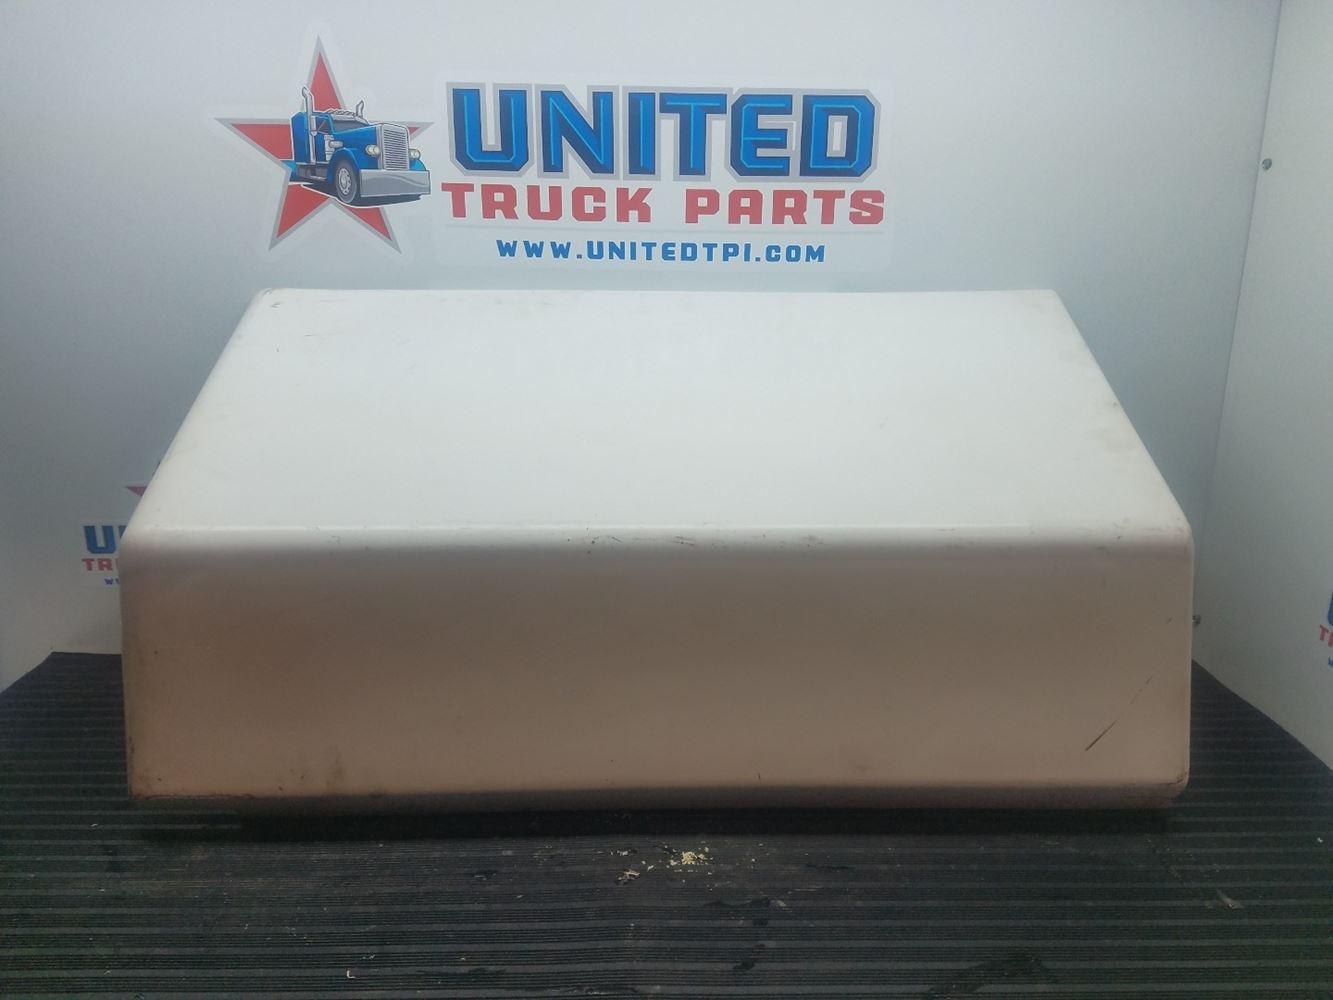 Trailer Parts | United Truck Parts Inc